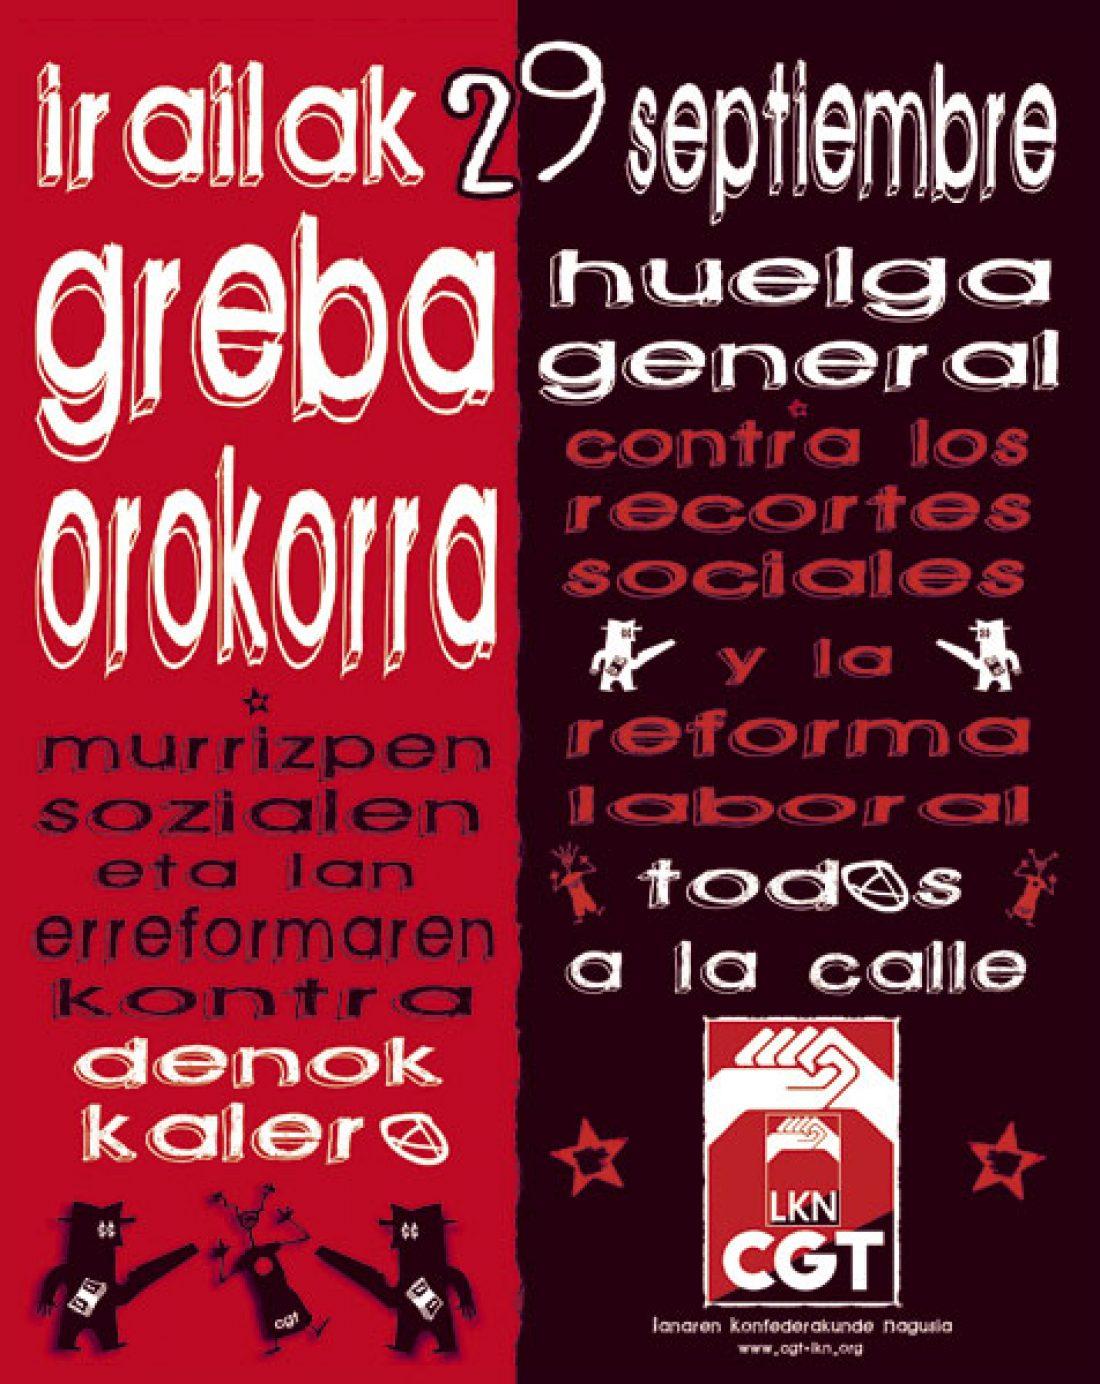 Comunicado de CGT-LKN Nafarroa: De nuevo a la calle. ¡29S Huelga General!